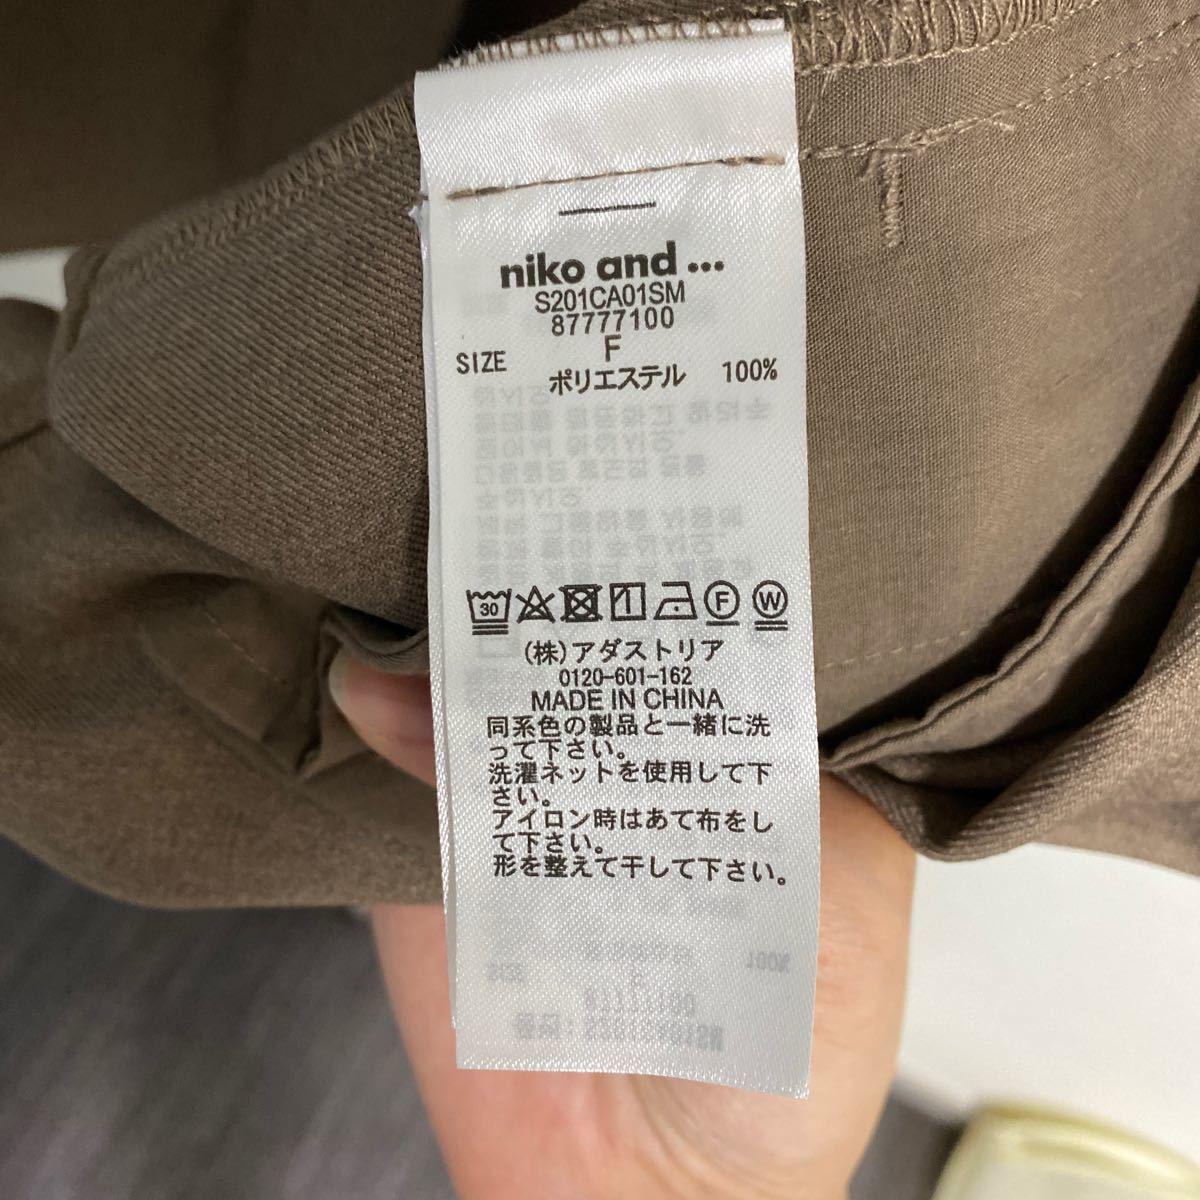 【niko and...】 ウォッシャブルワイドCPOシャツ